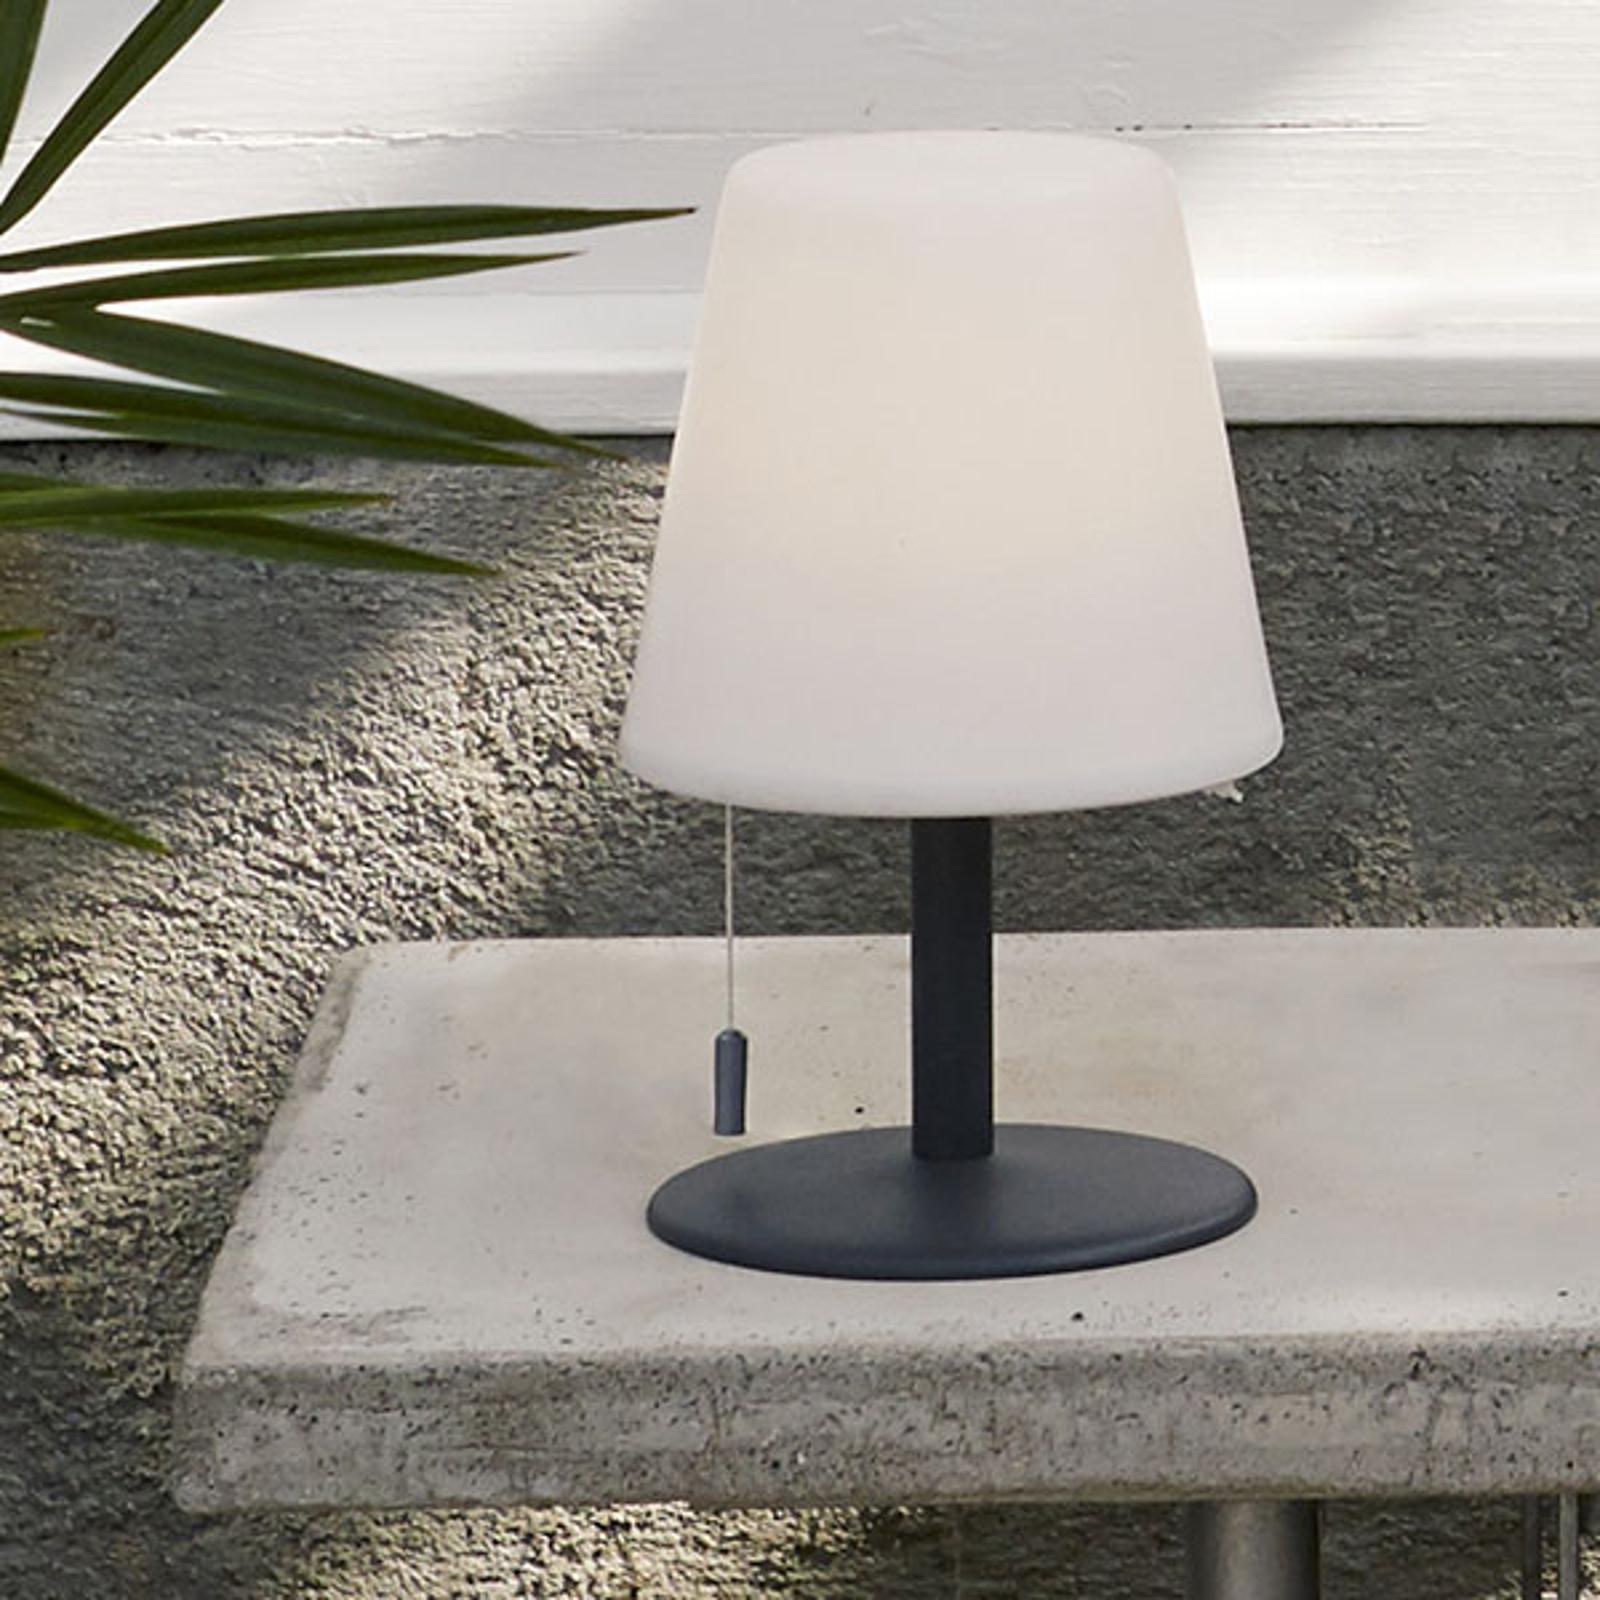 Lampa stołowa LED Gardenlight Kreta, 26,5 cm